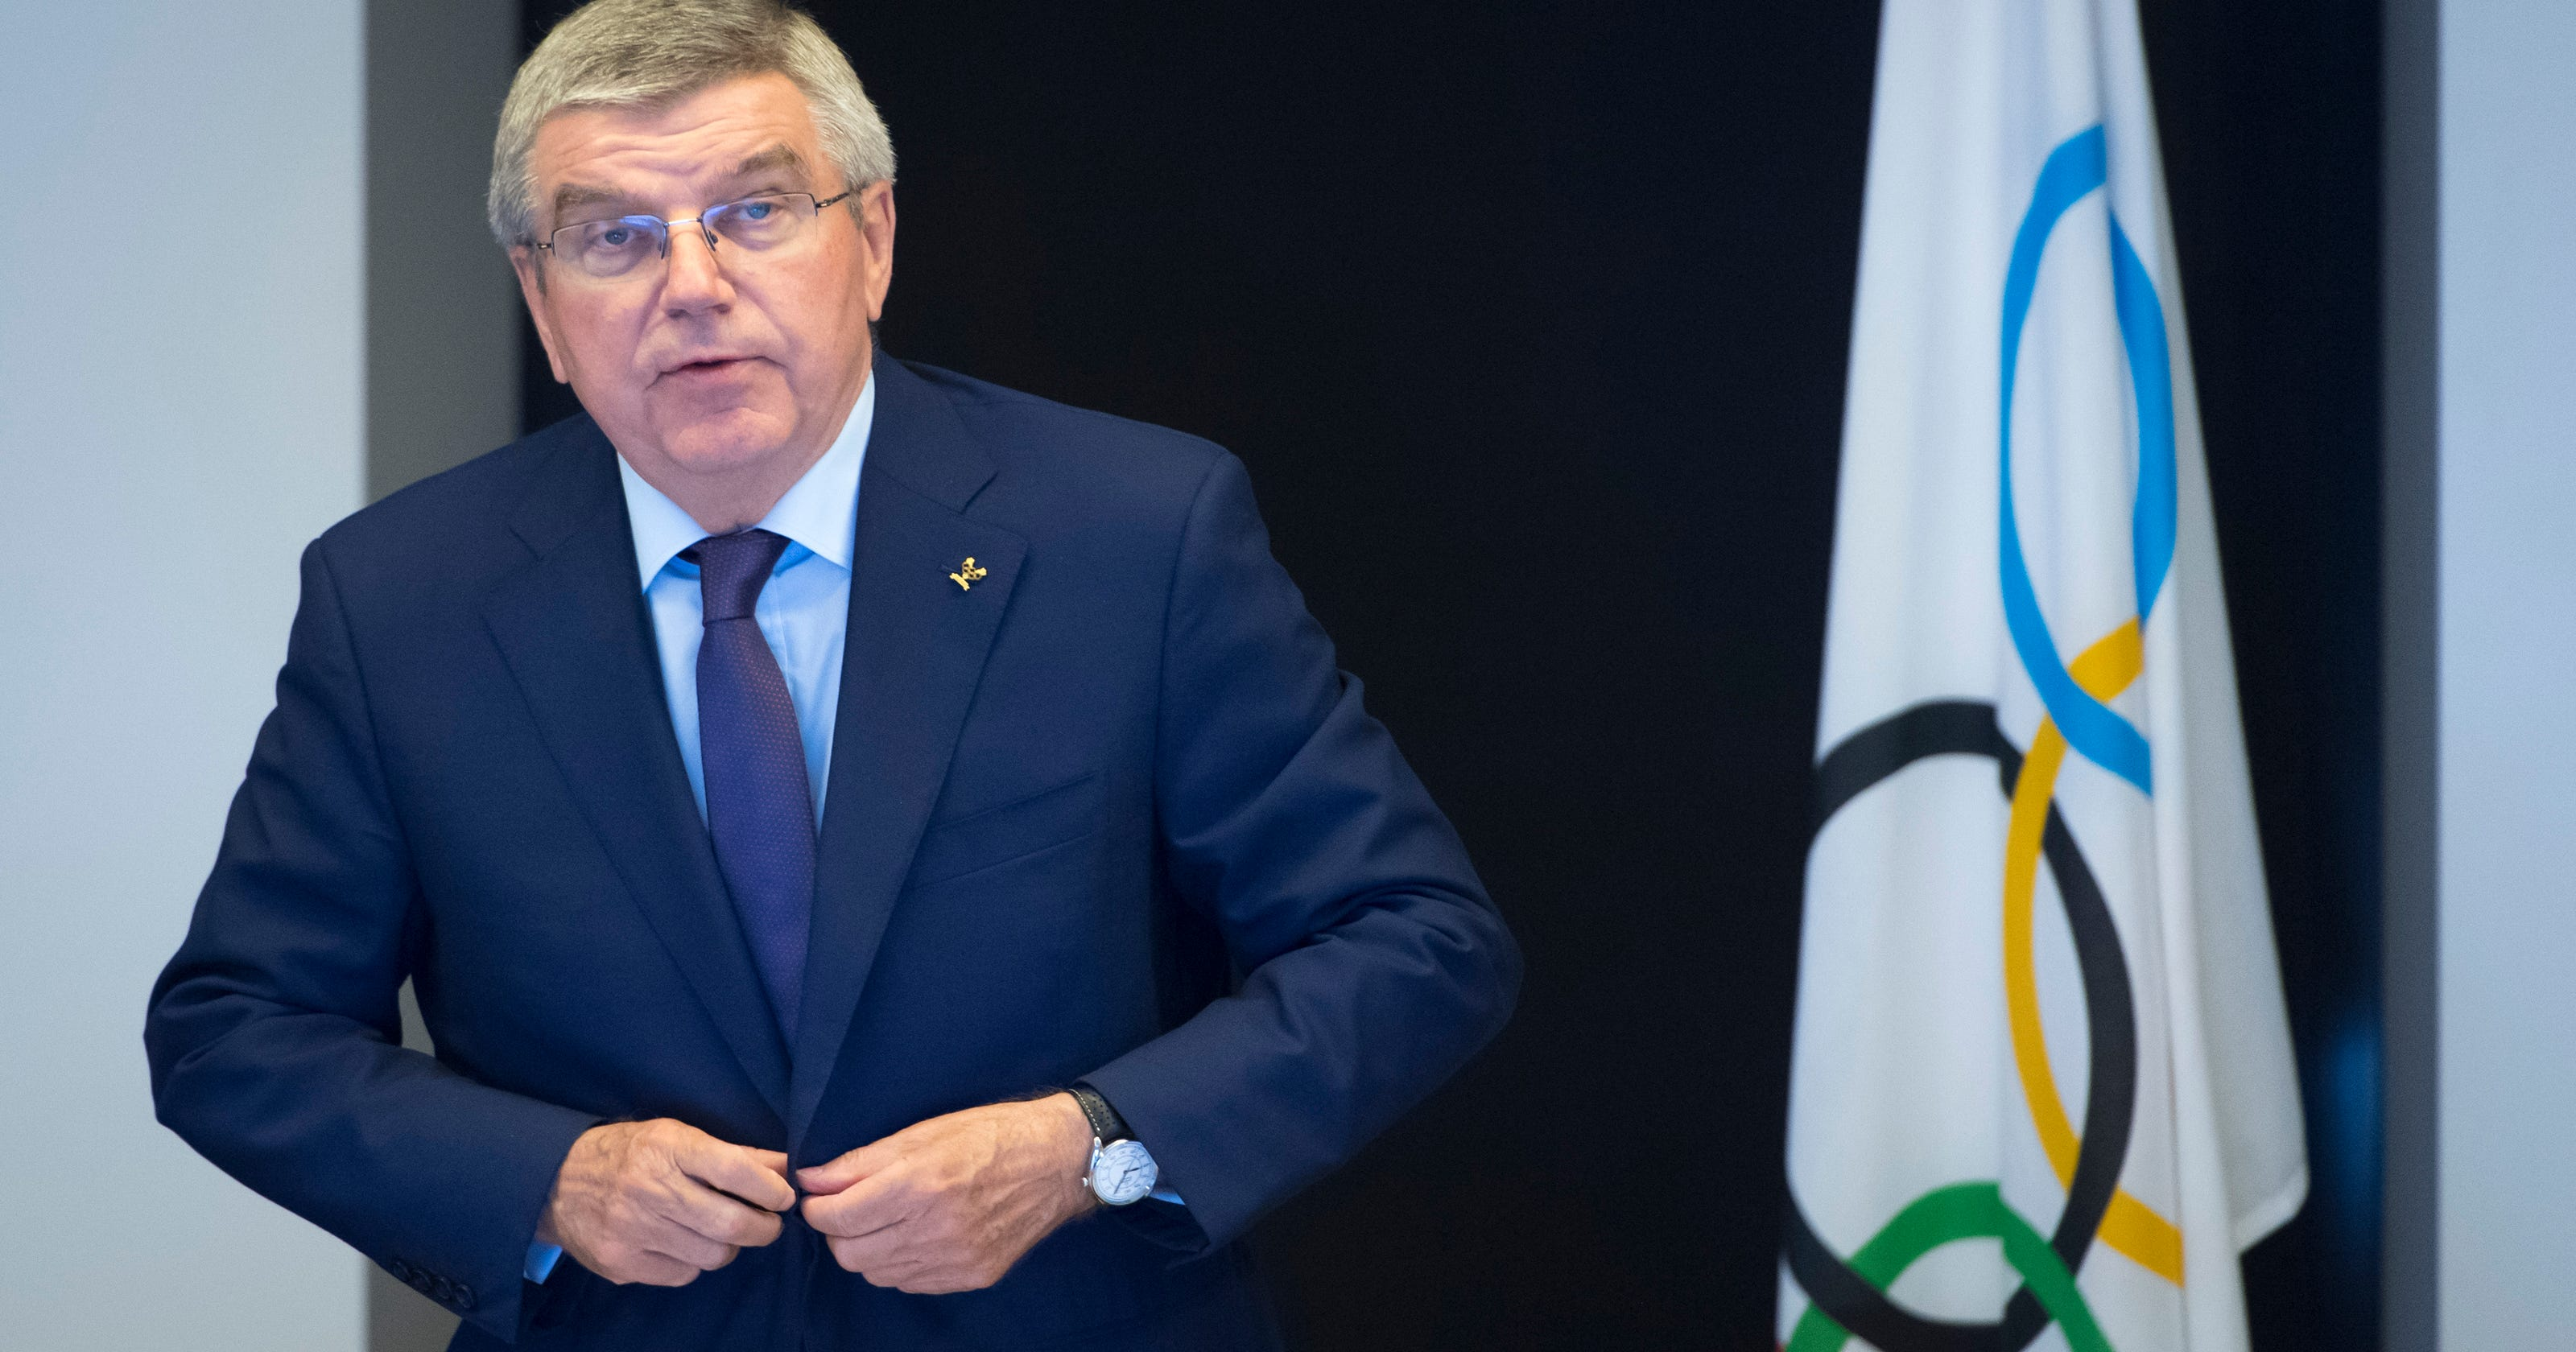 IOC wants to remove boxing body AIBA from Tokyo Olympics